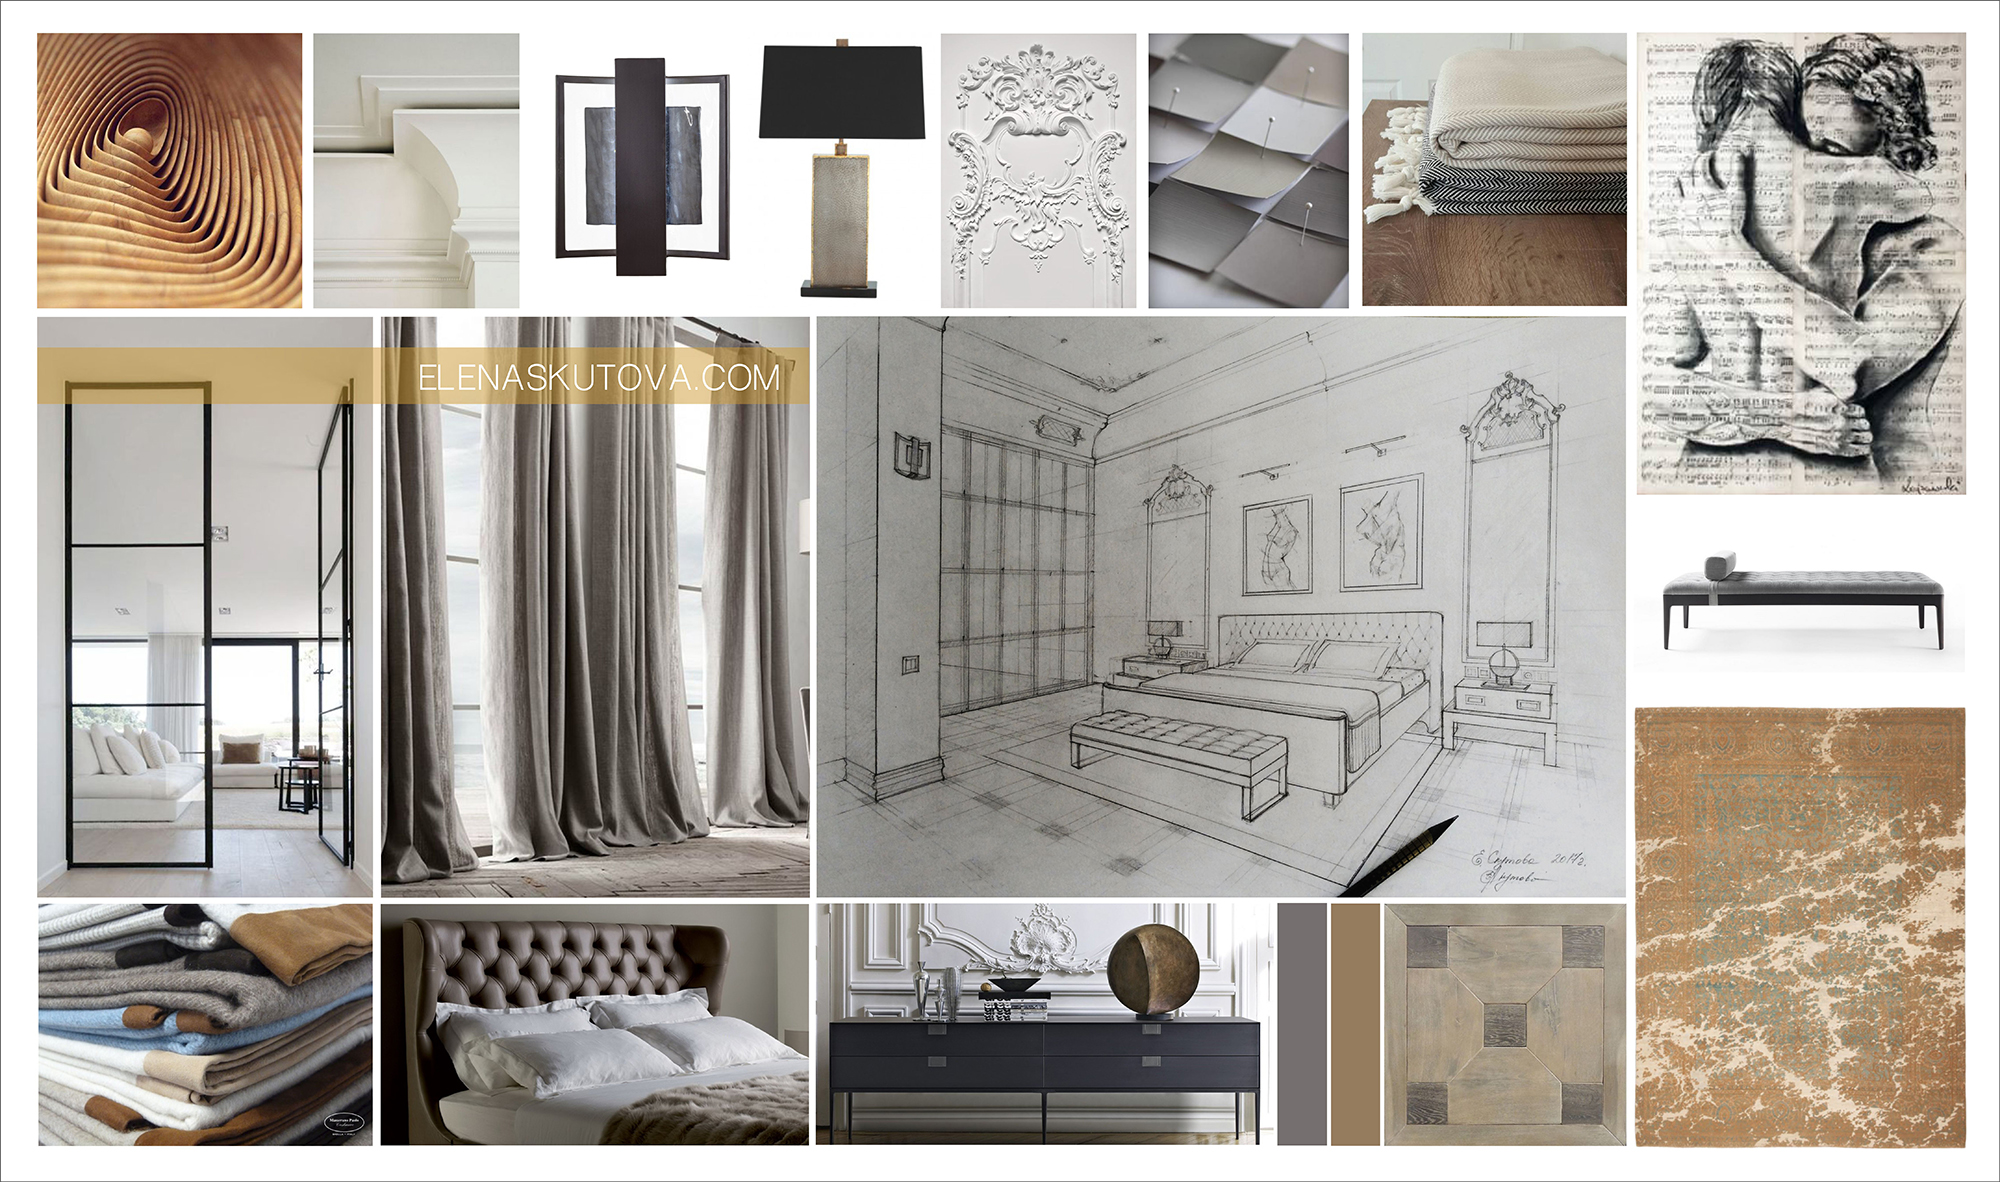 Концепция спальной комнаты